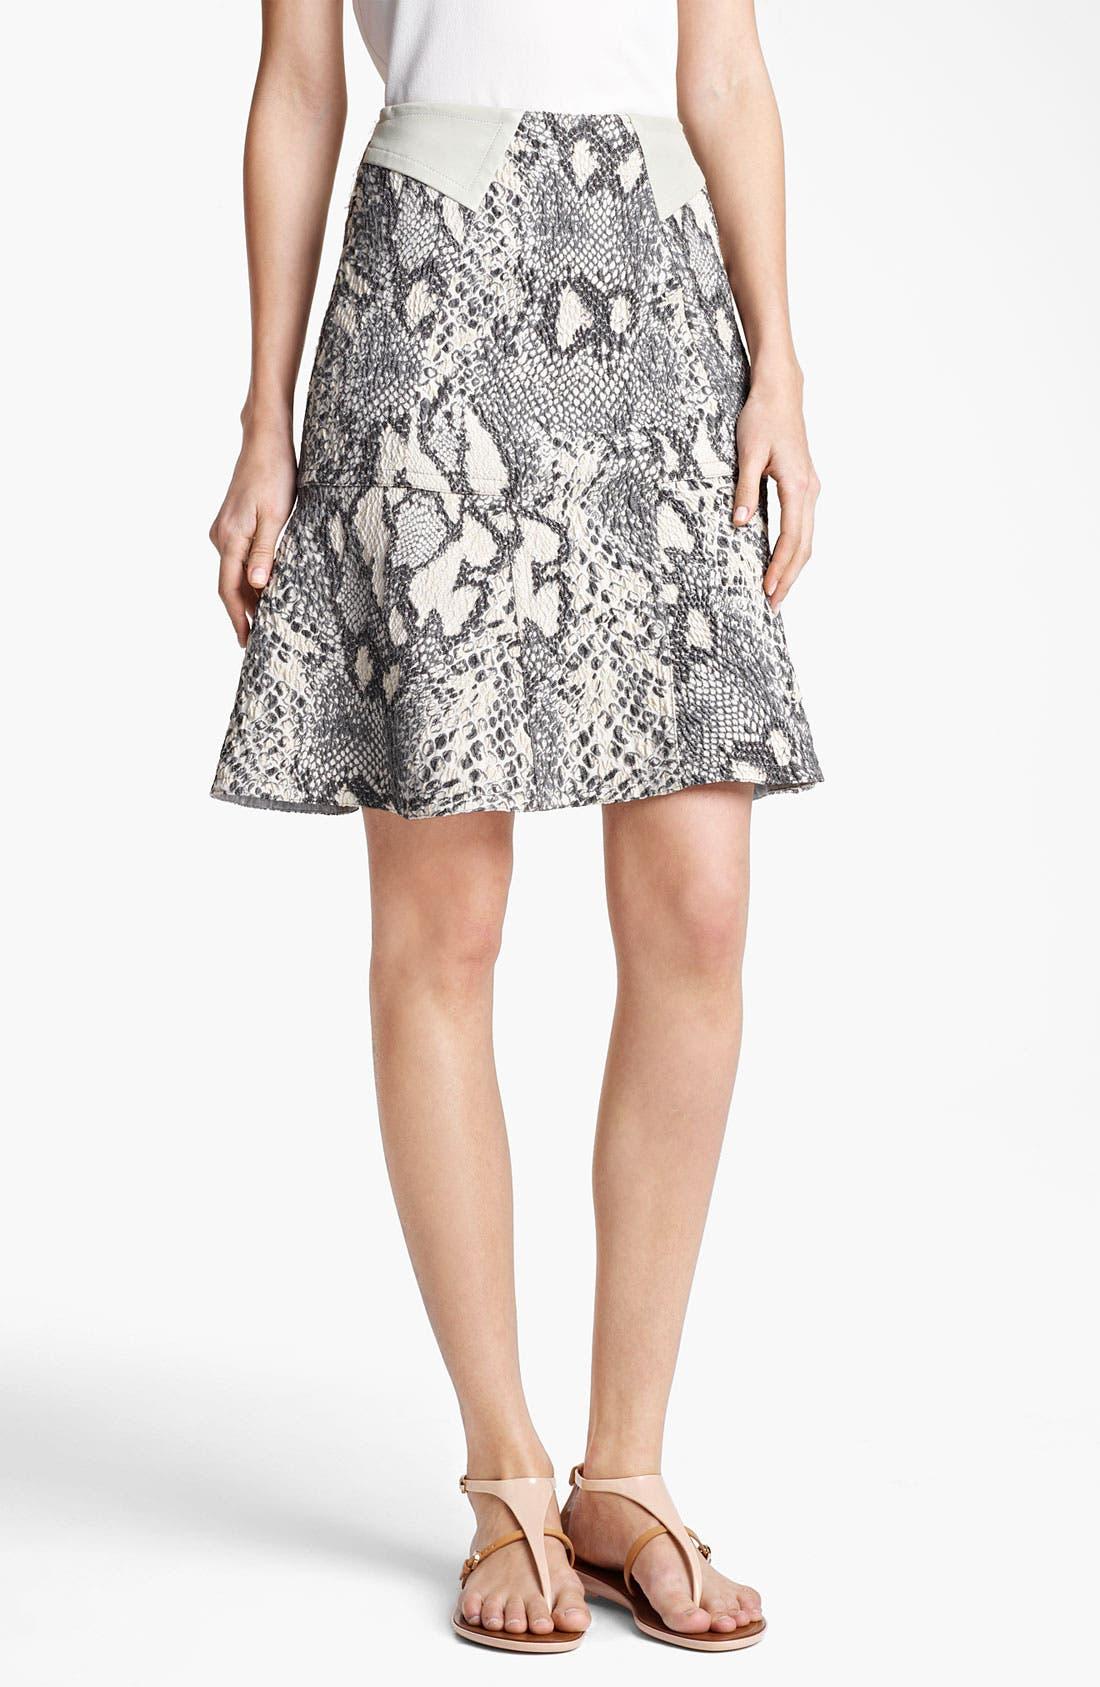 Alternate Image 1 Selected - Yigal Azrouël Jacquard Skirt